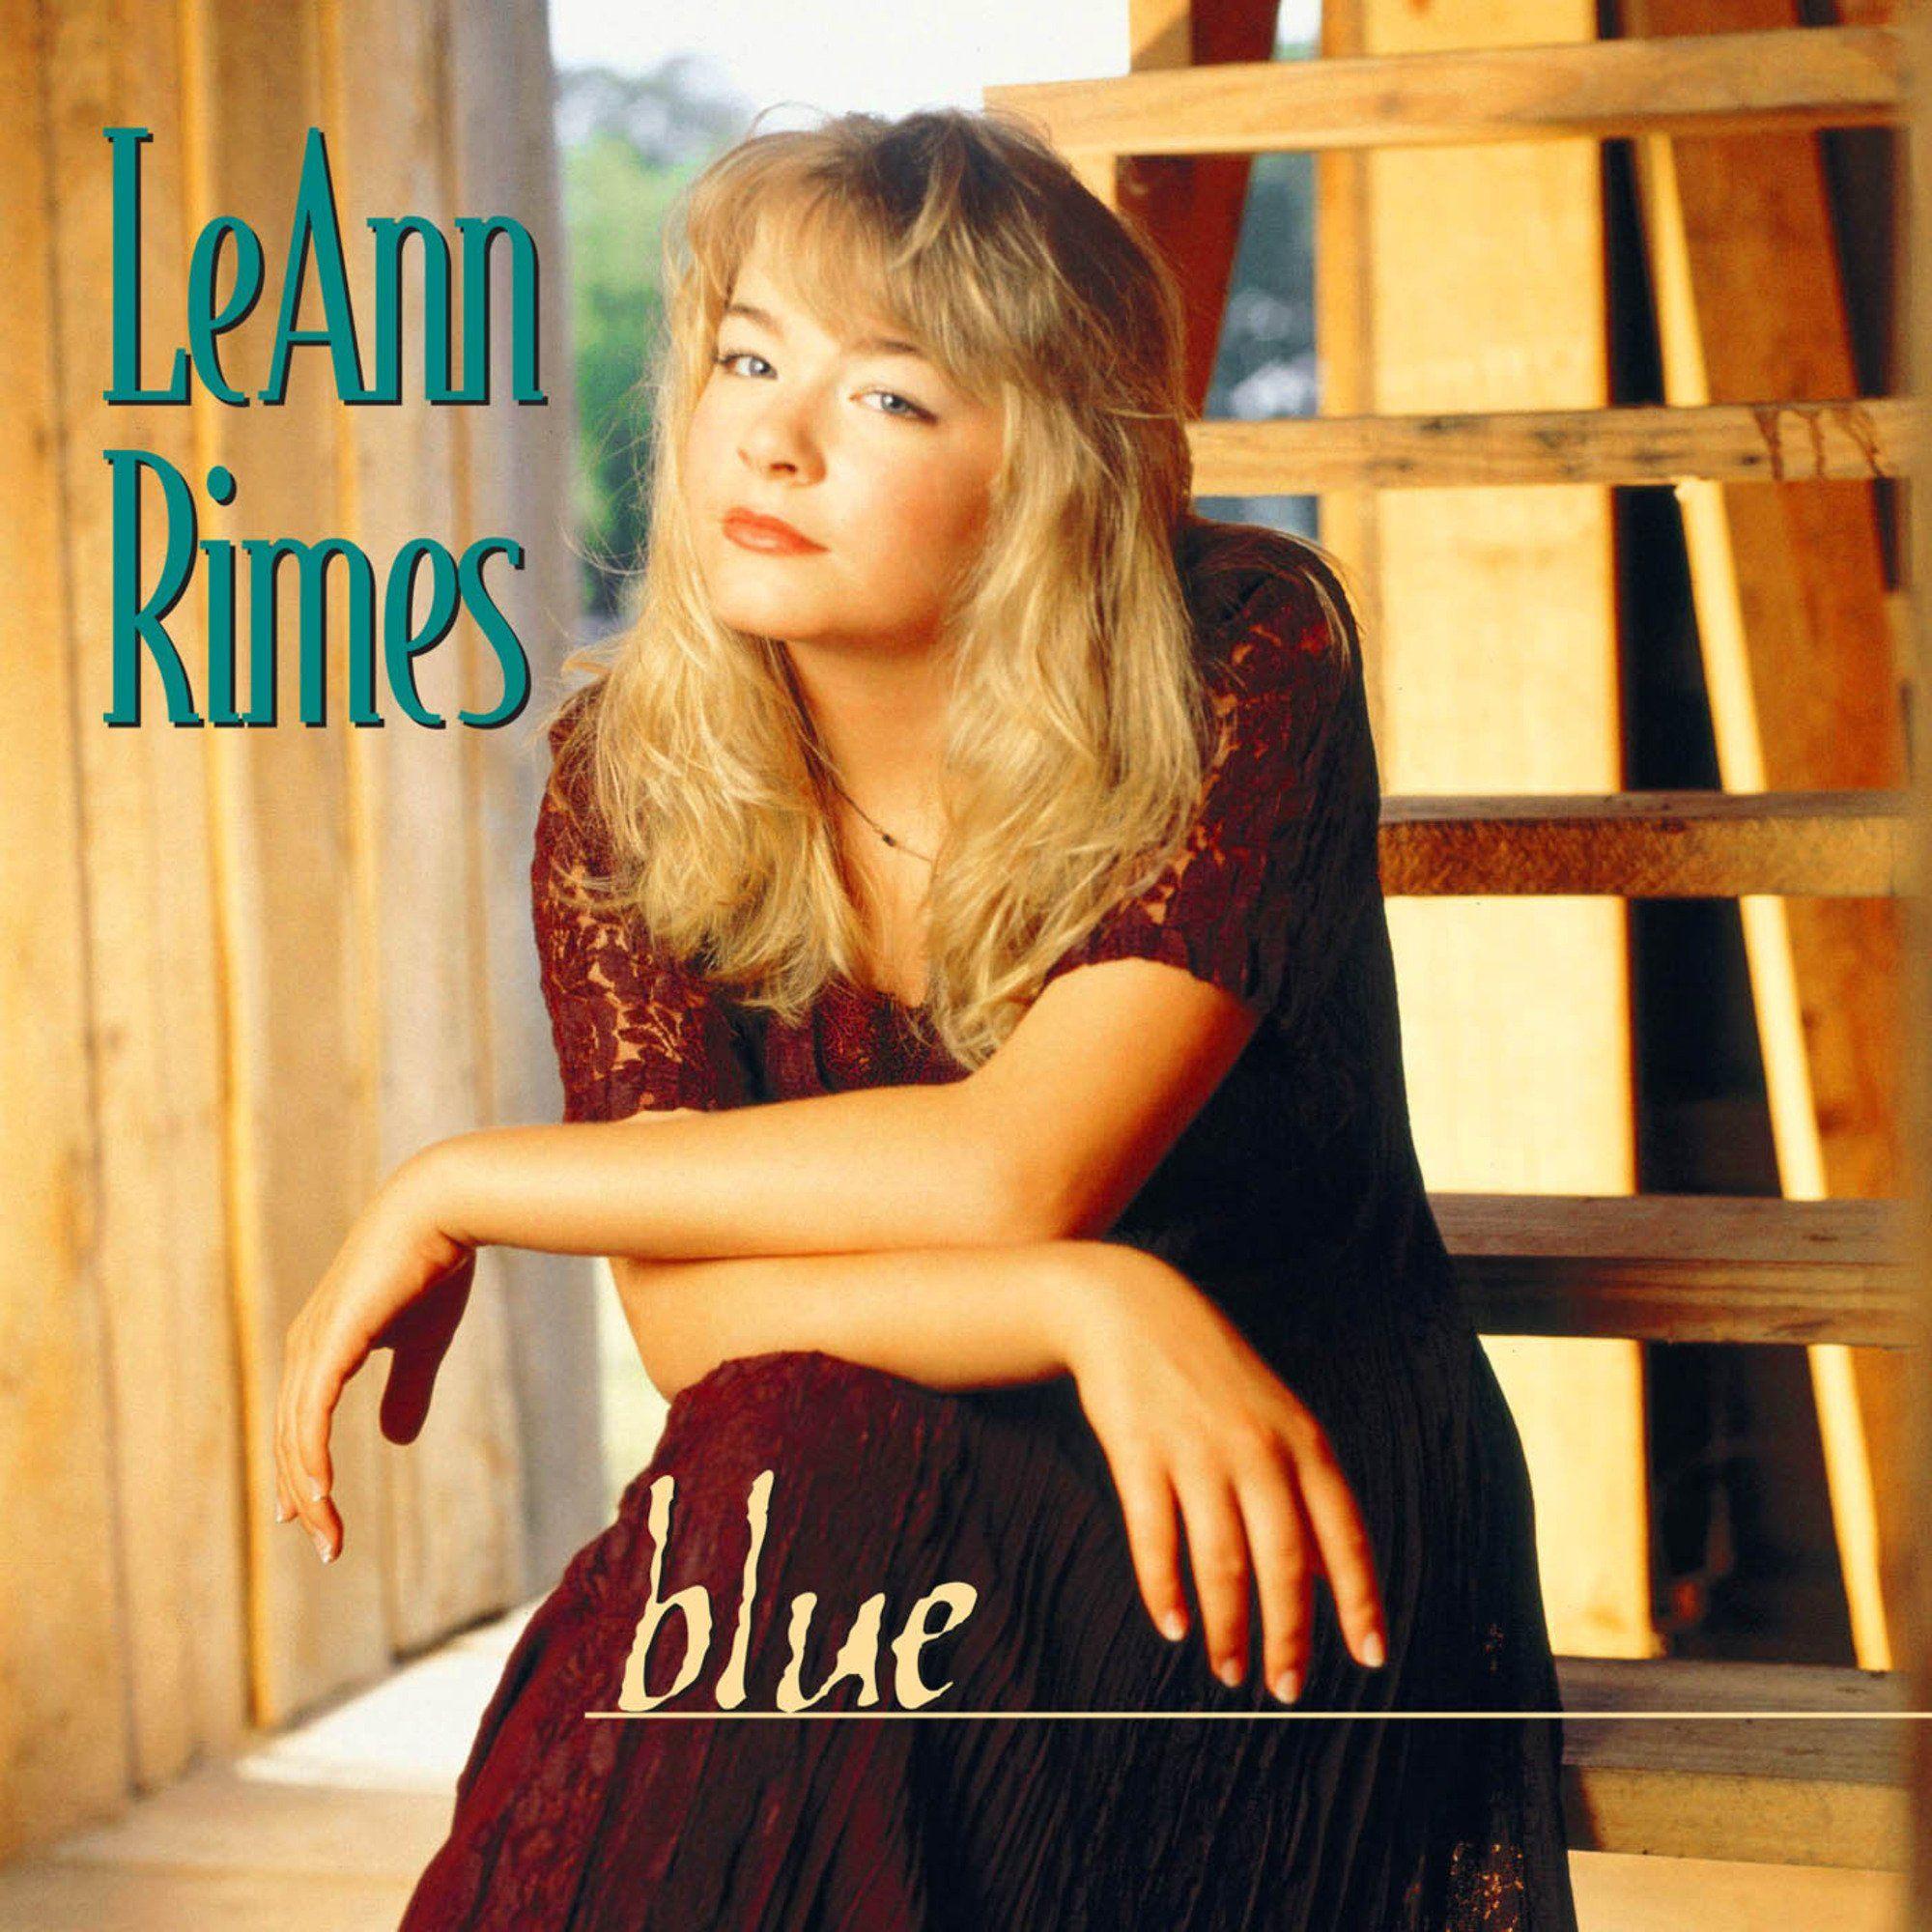 LeAnn Rimes - Blue - Album Cover